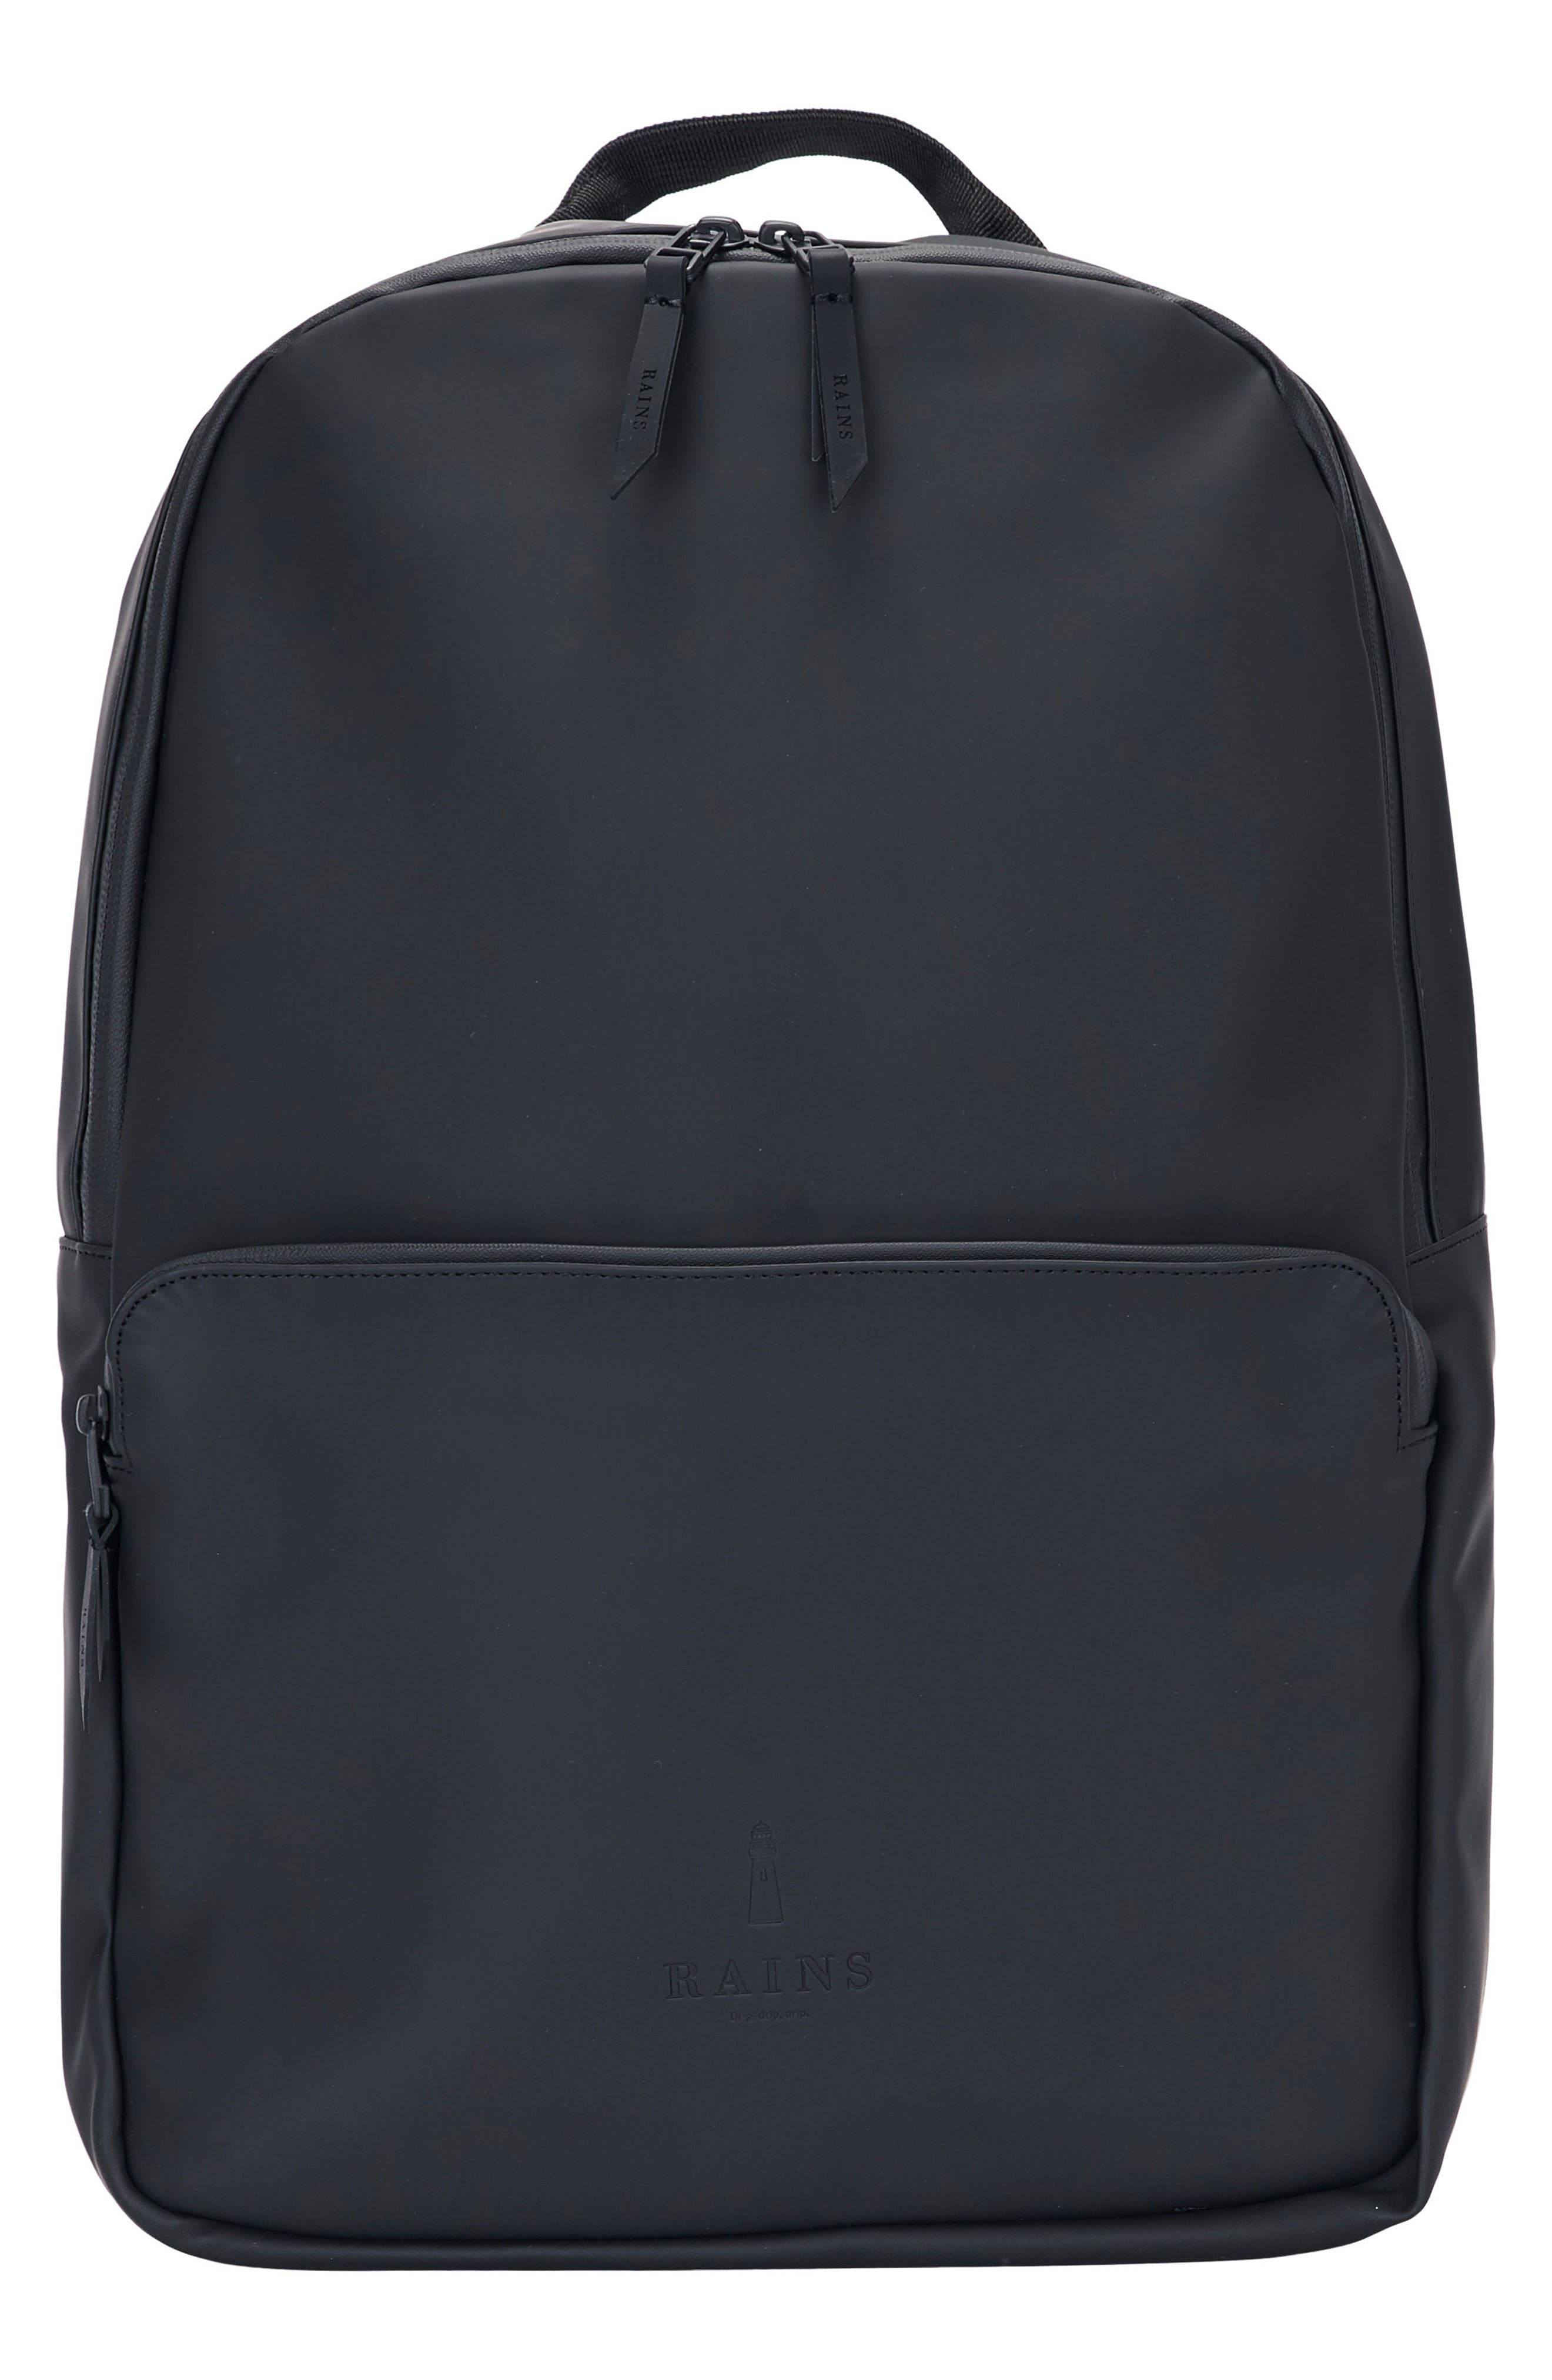 RAINS, Field Backpack, Main thumbnail 1, color, BLACK